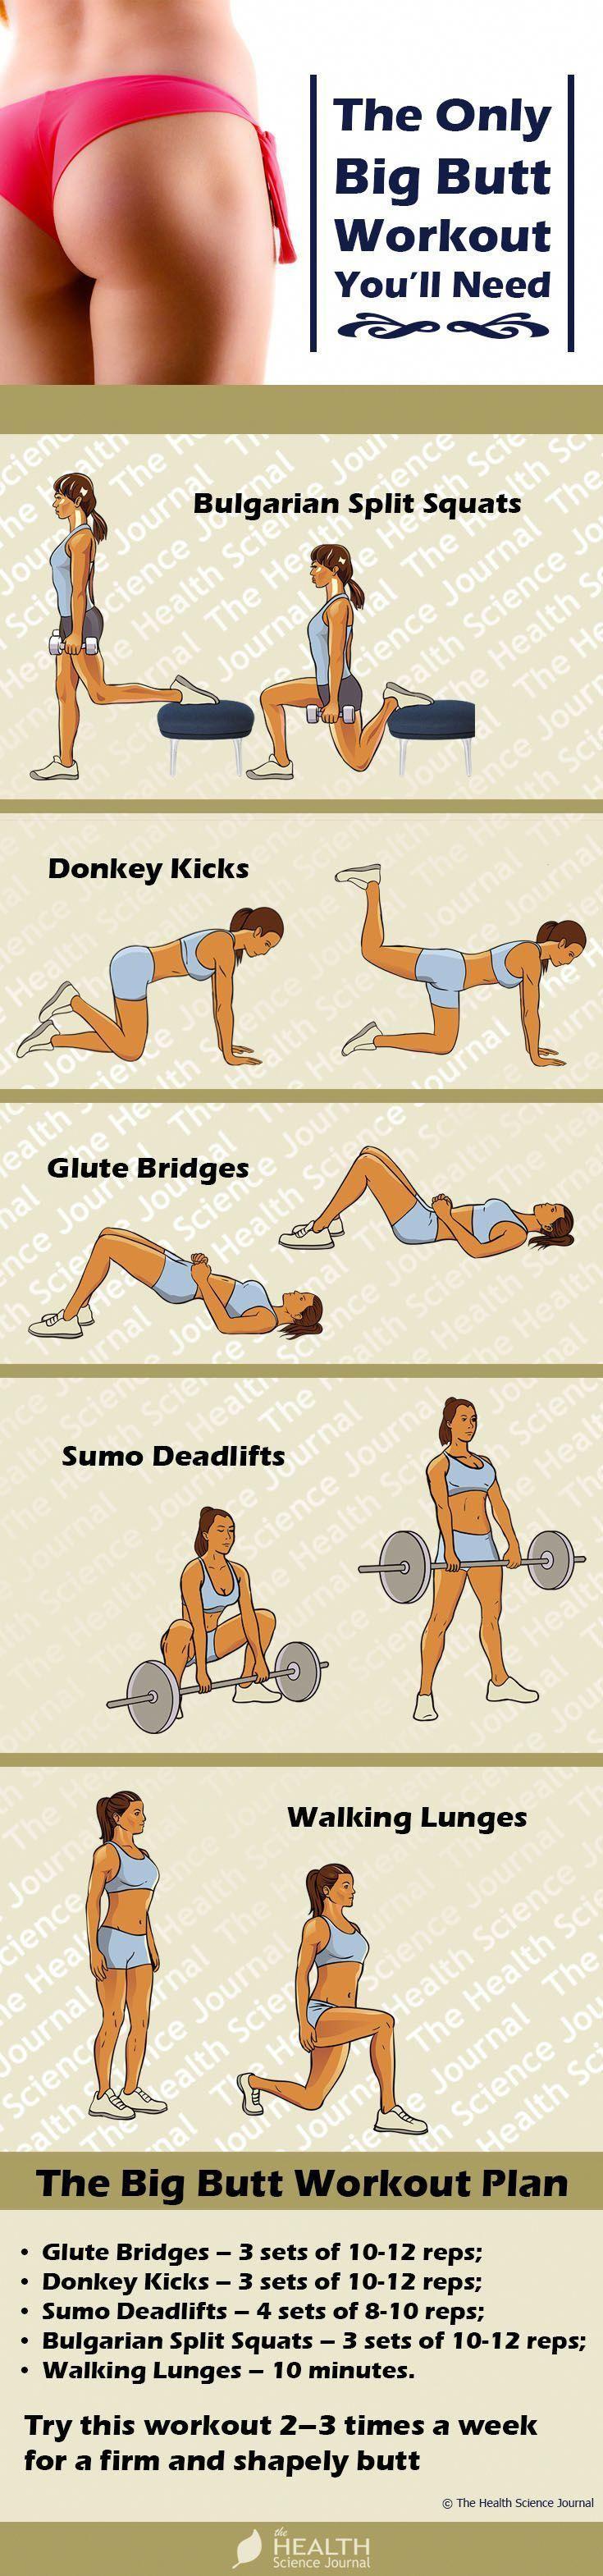 Strategies for mens exercises 612 #mensexercises